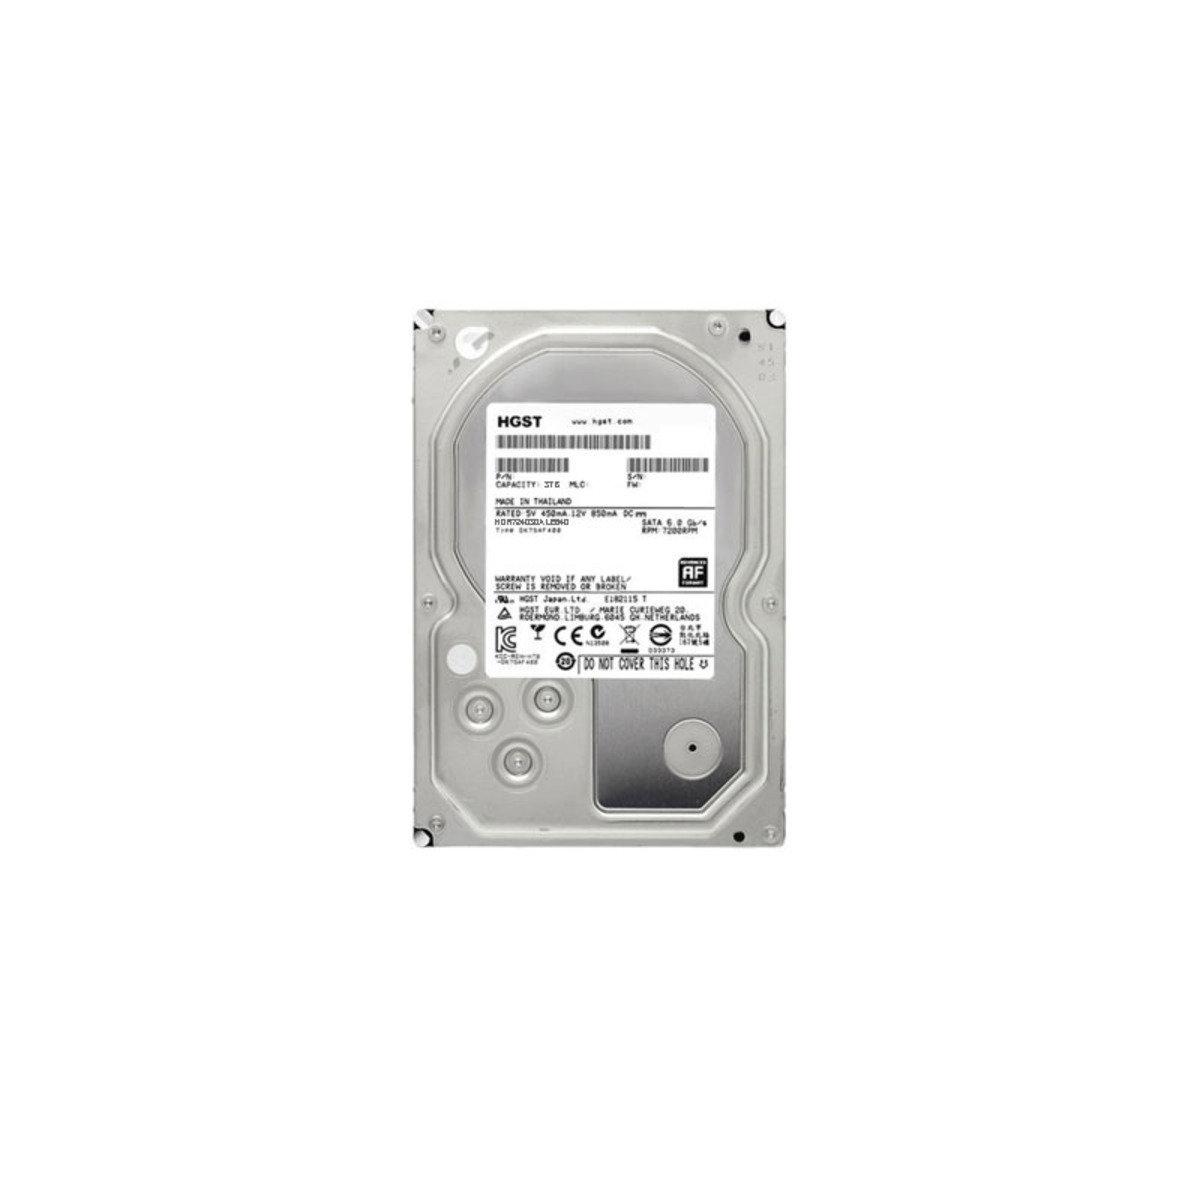 DESKSTAR NAS 3TB 高效能 7200rpm 硬碟 HDN724030ALE640